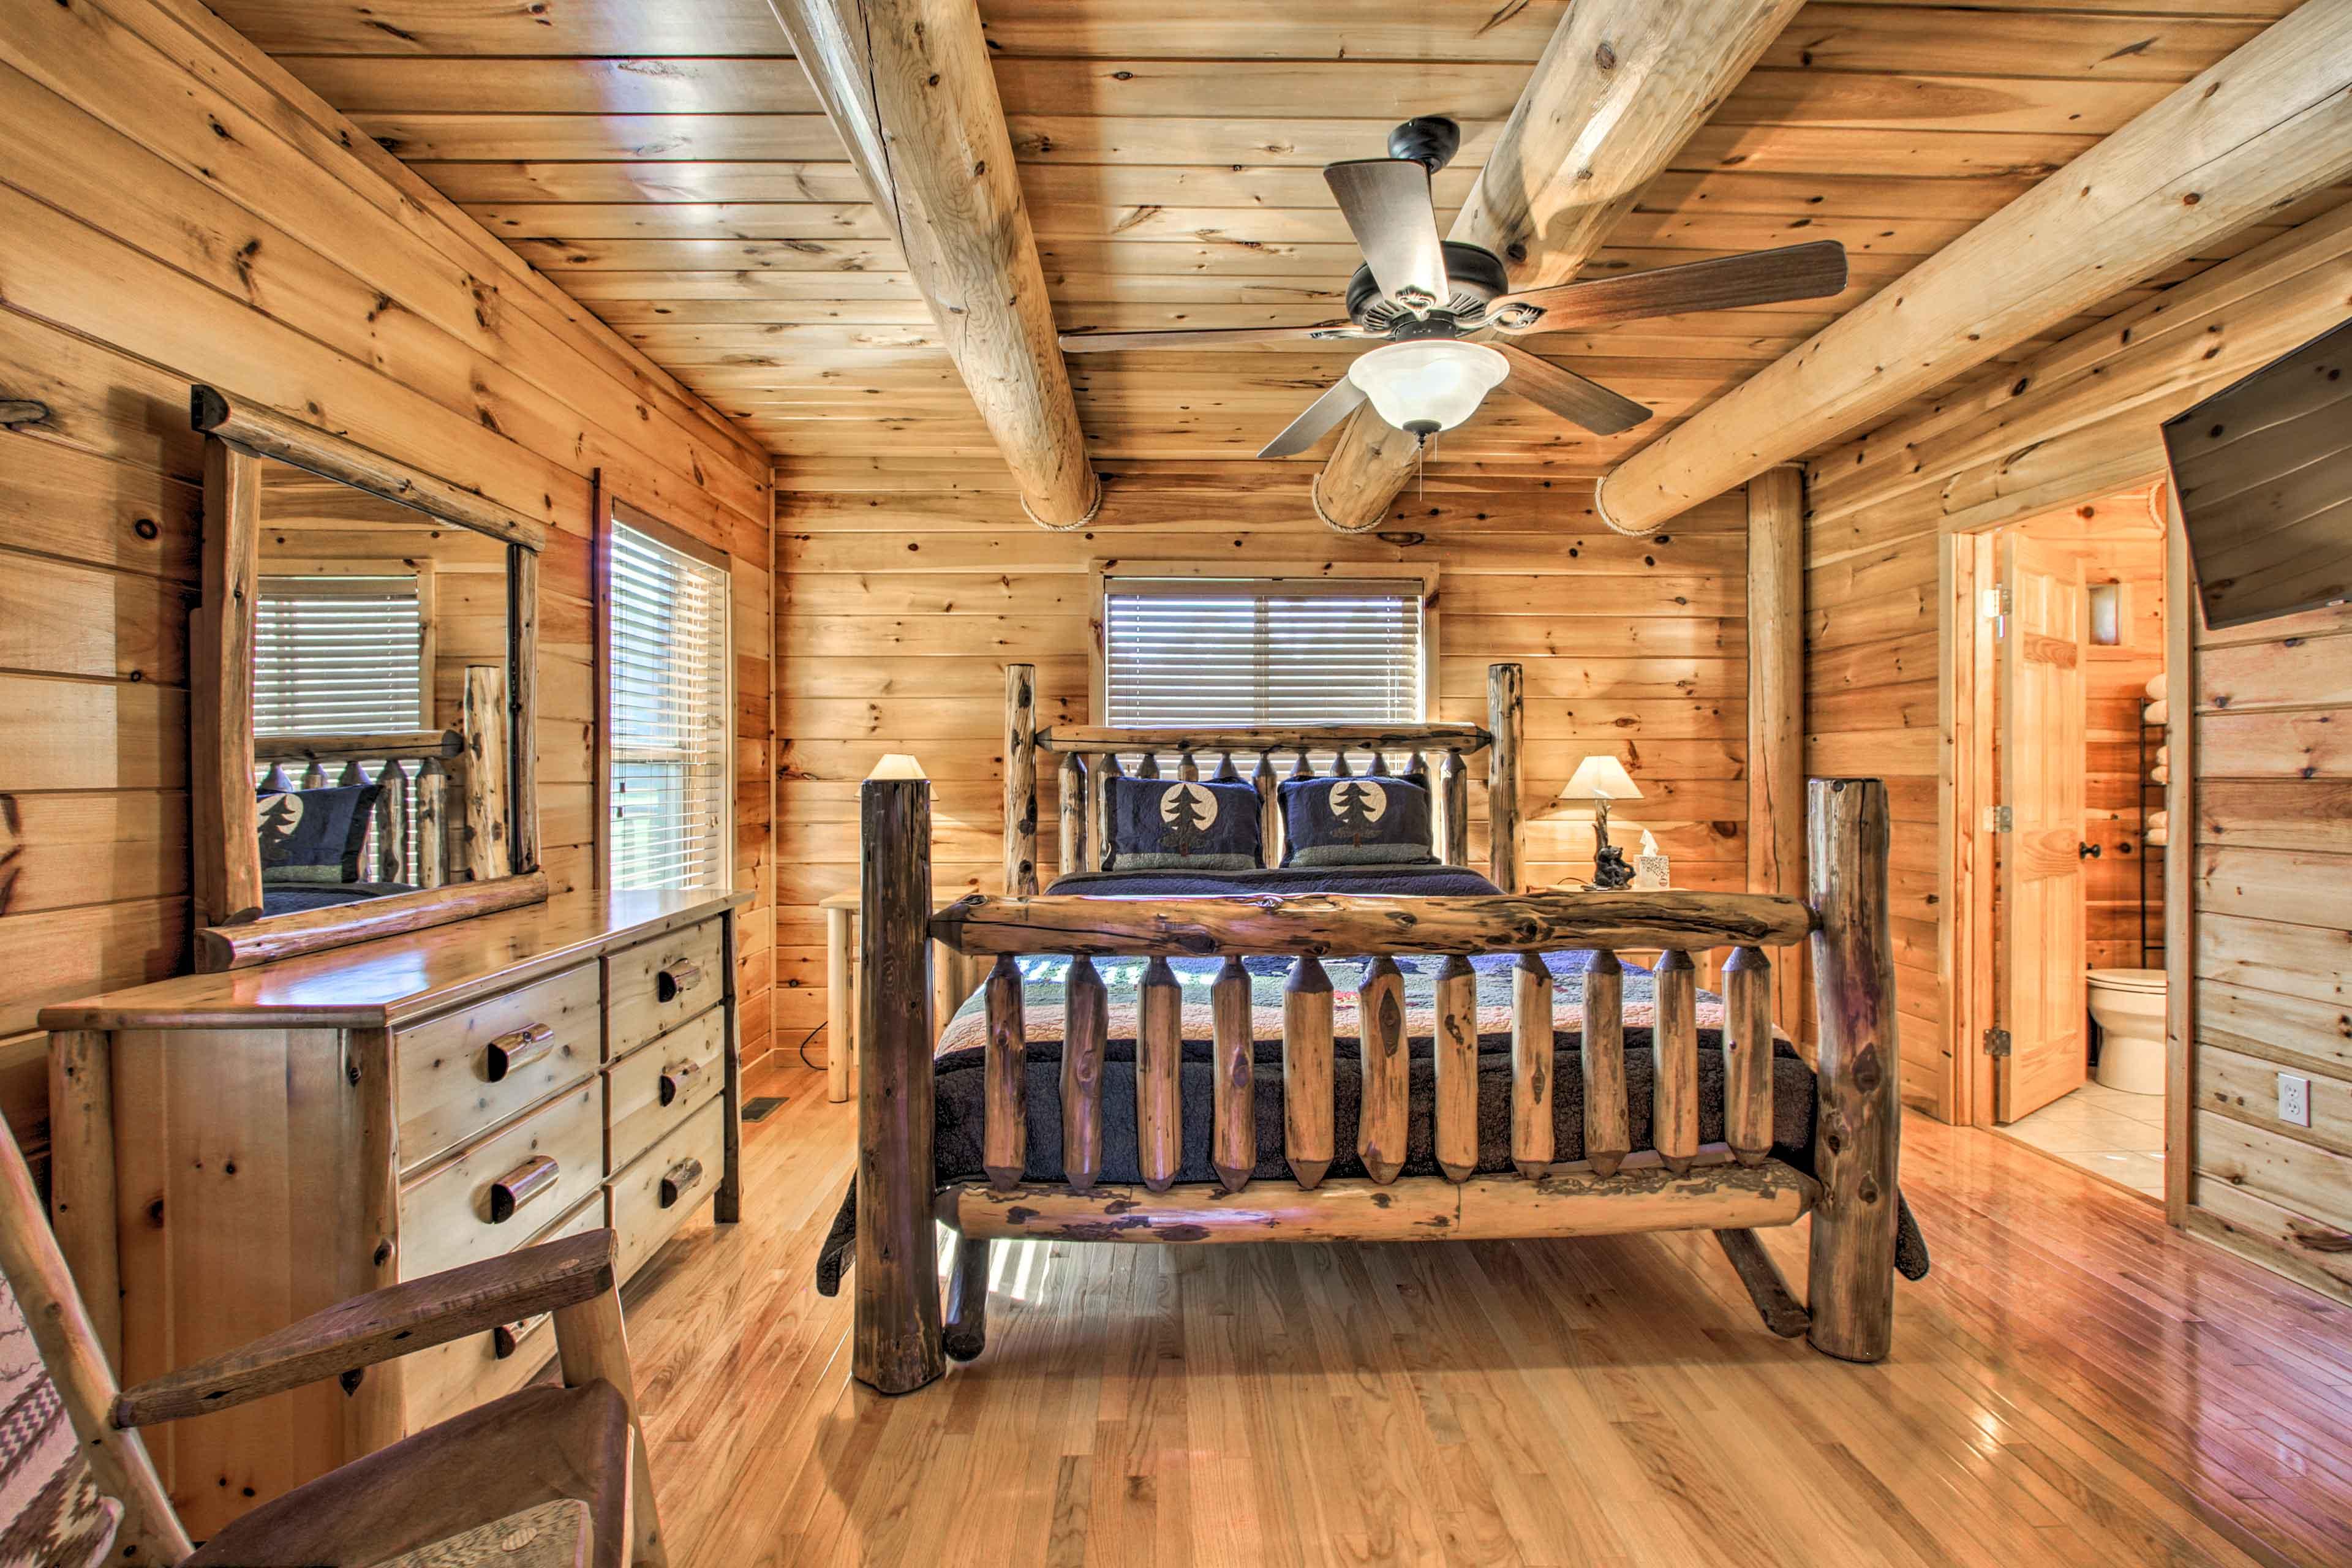 All 3 bedrooms house custom log furnishings.